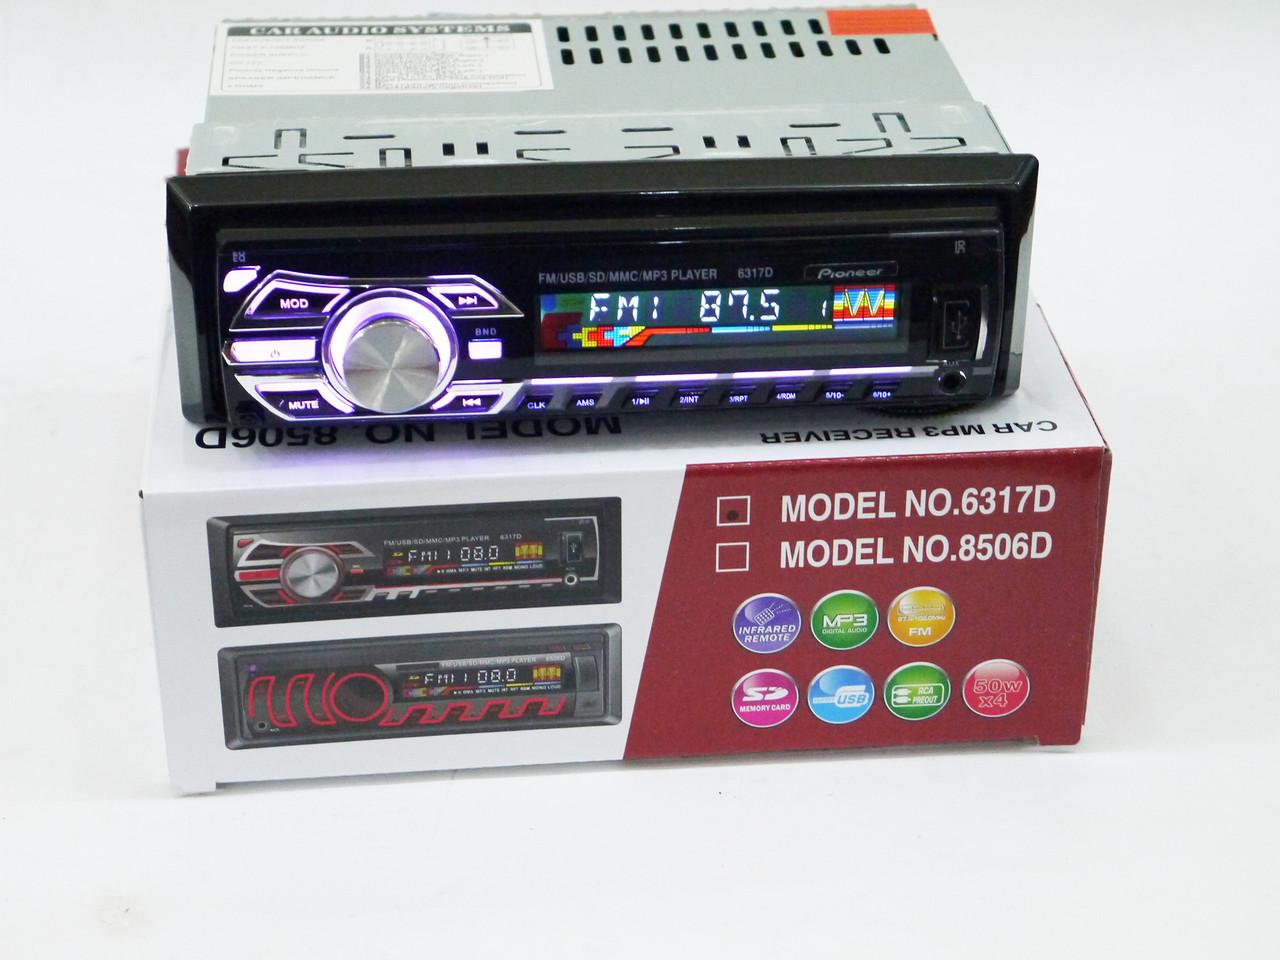 Автомагнитола Pioneer 6317D Съемная панель - Usb+RGB подсветка+Fm+Aux+ пульт